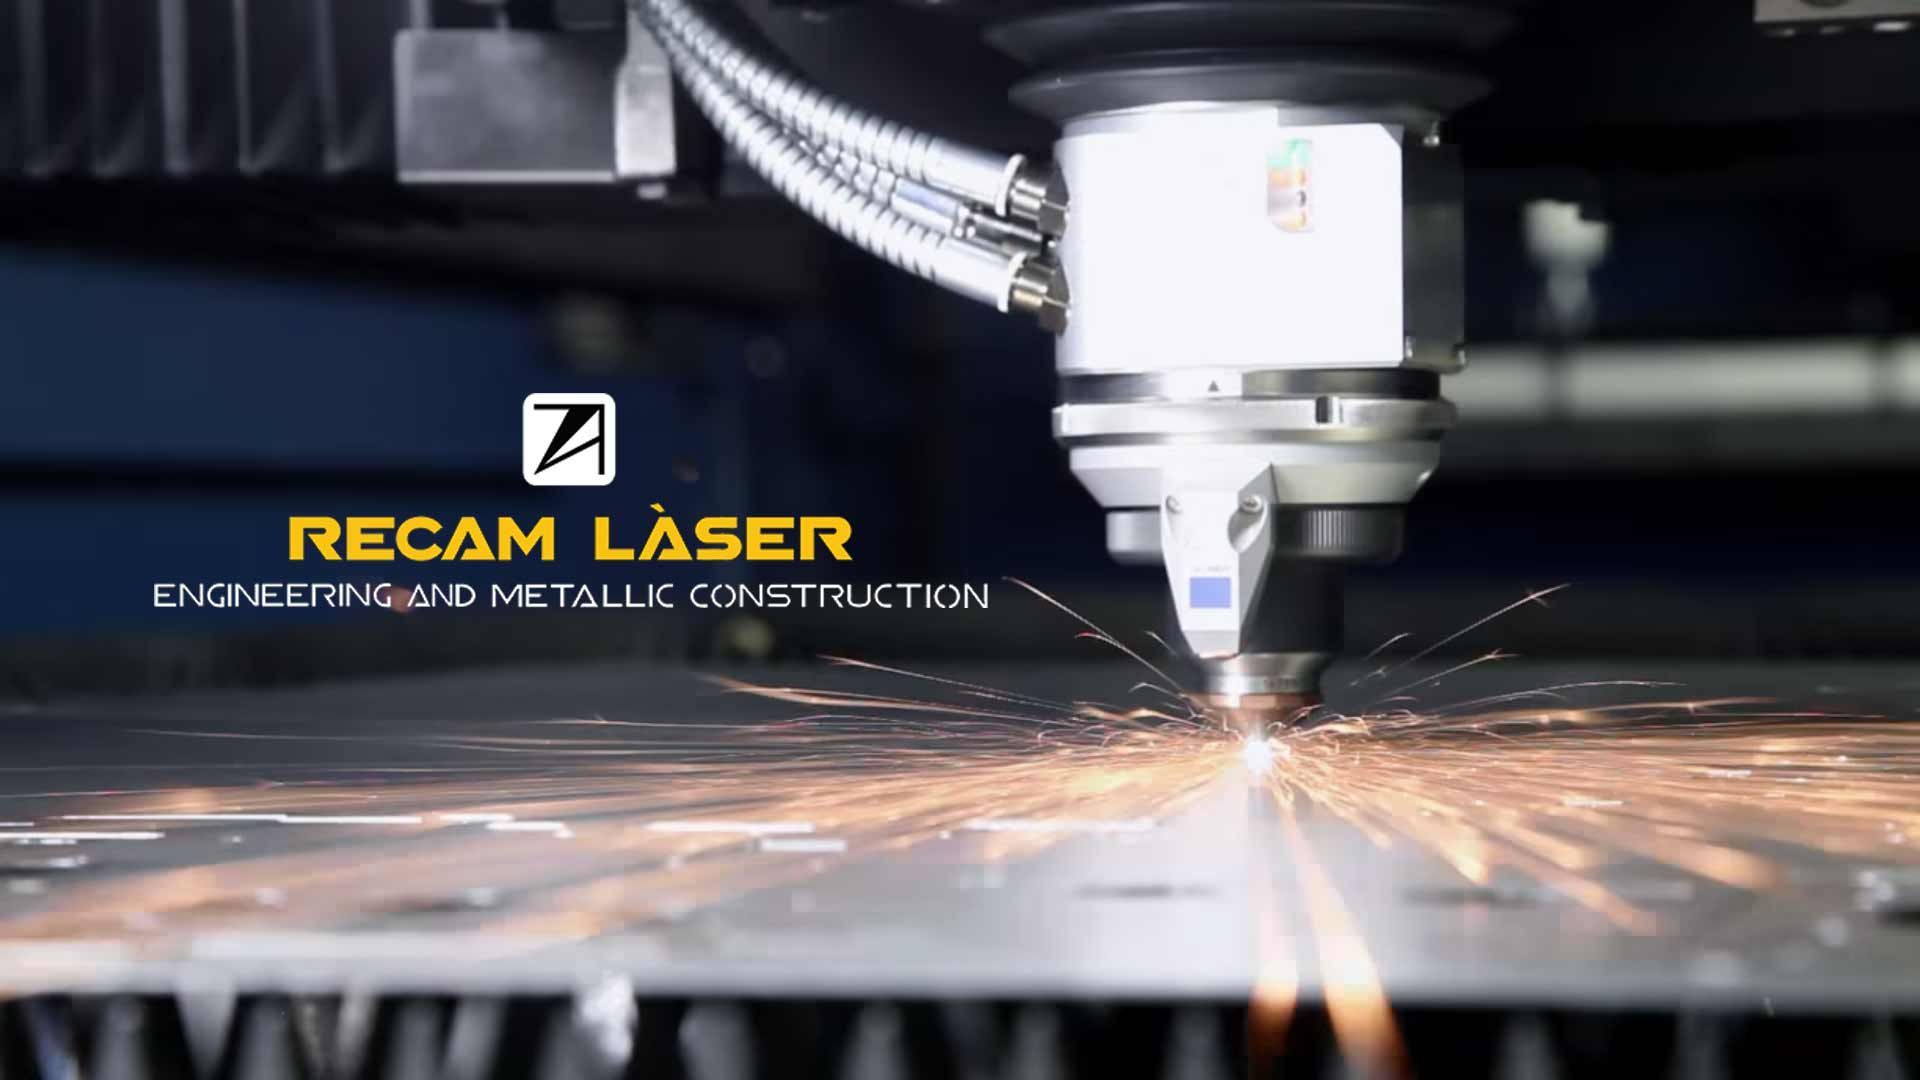 Recam Laser Company